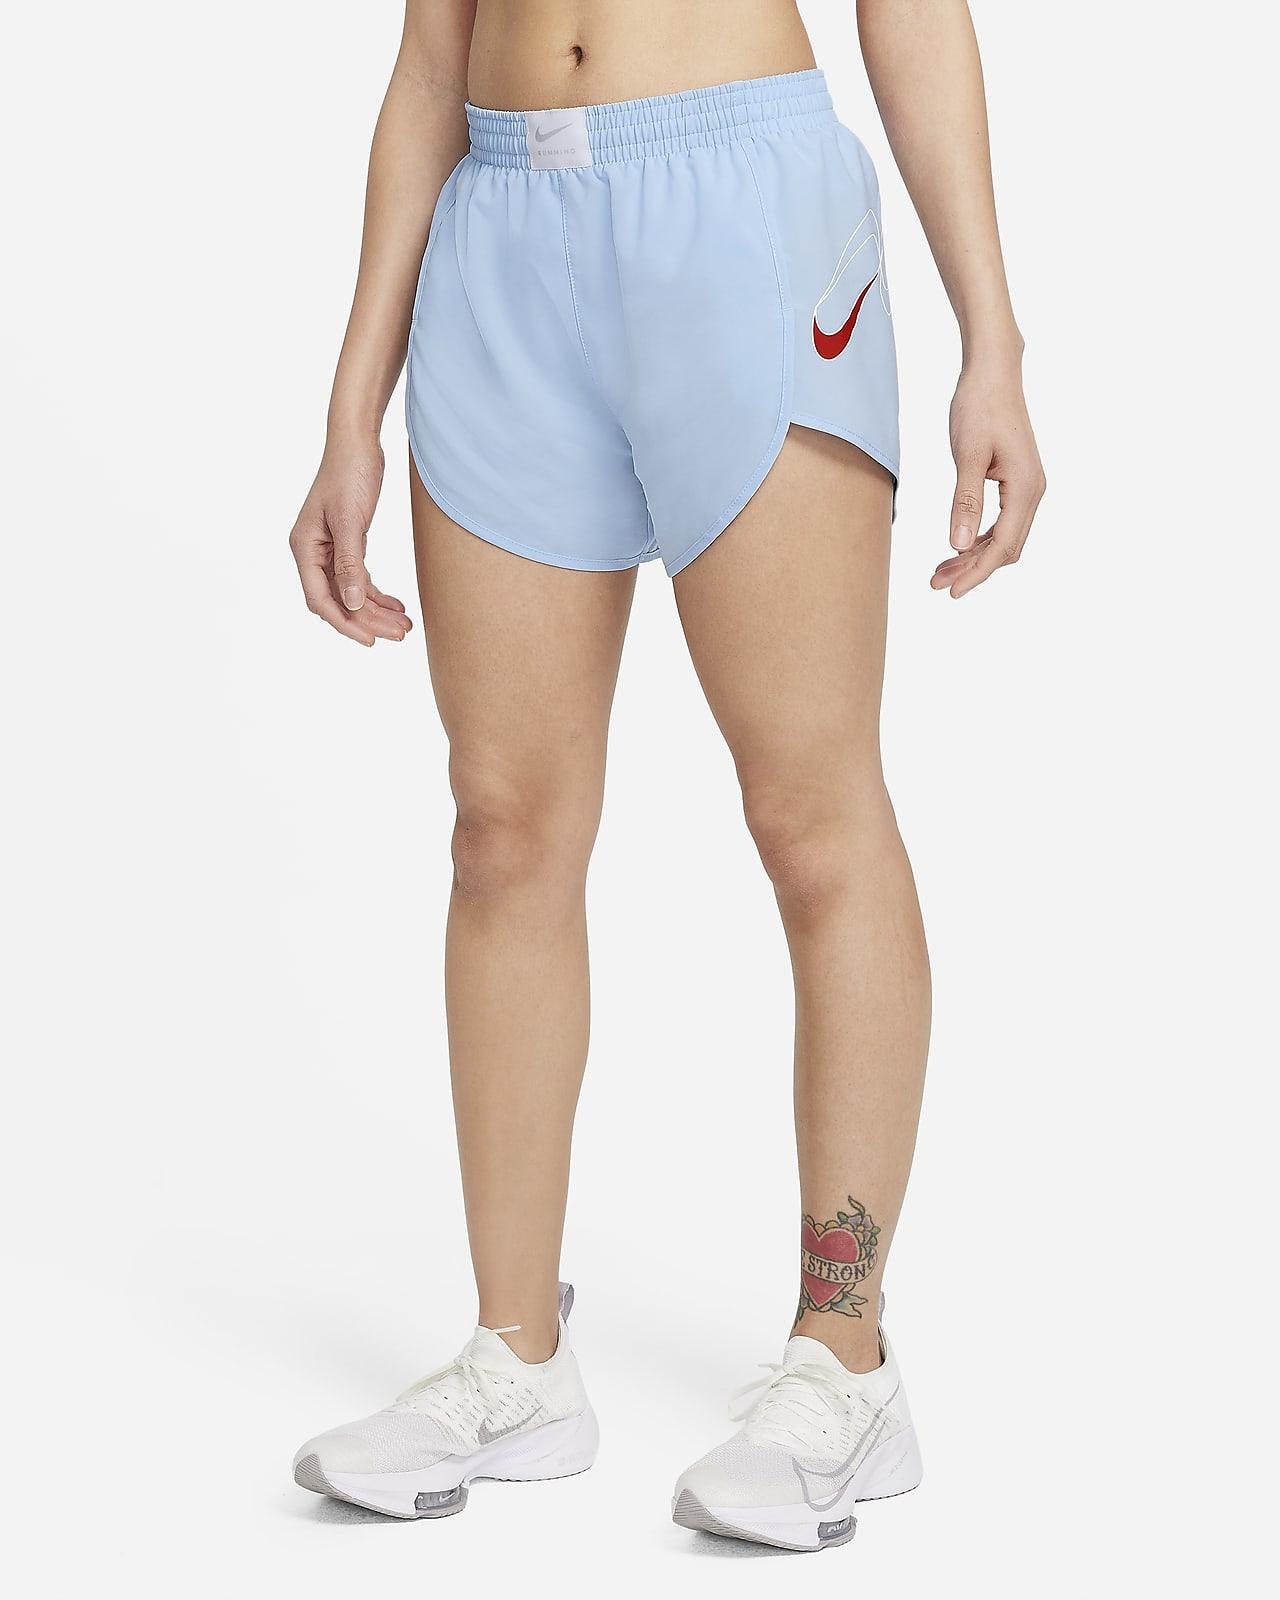 Nike Dri-FIT Retro Women's Brief-Lined Running Shorts